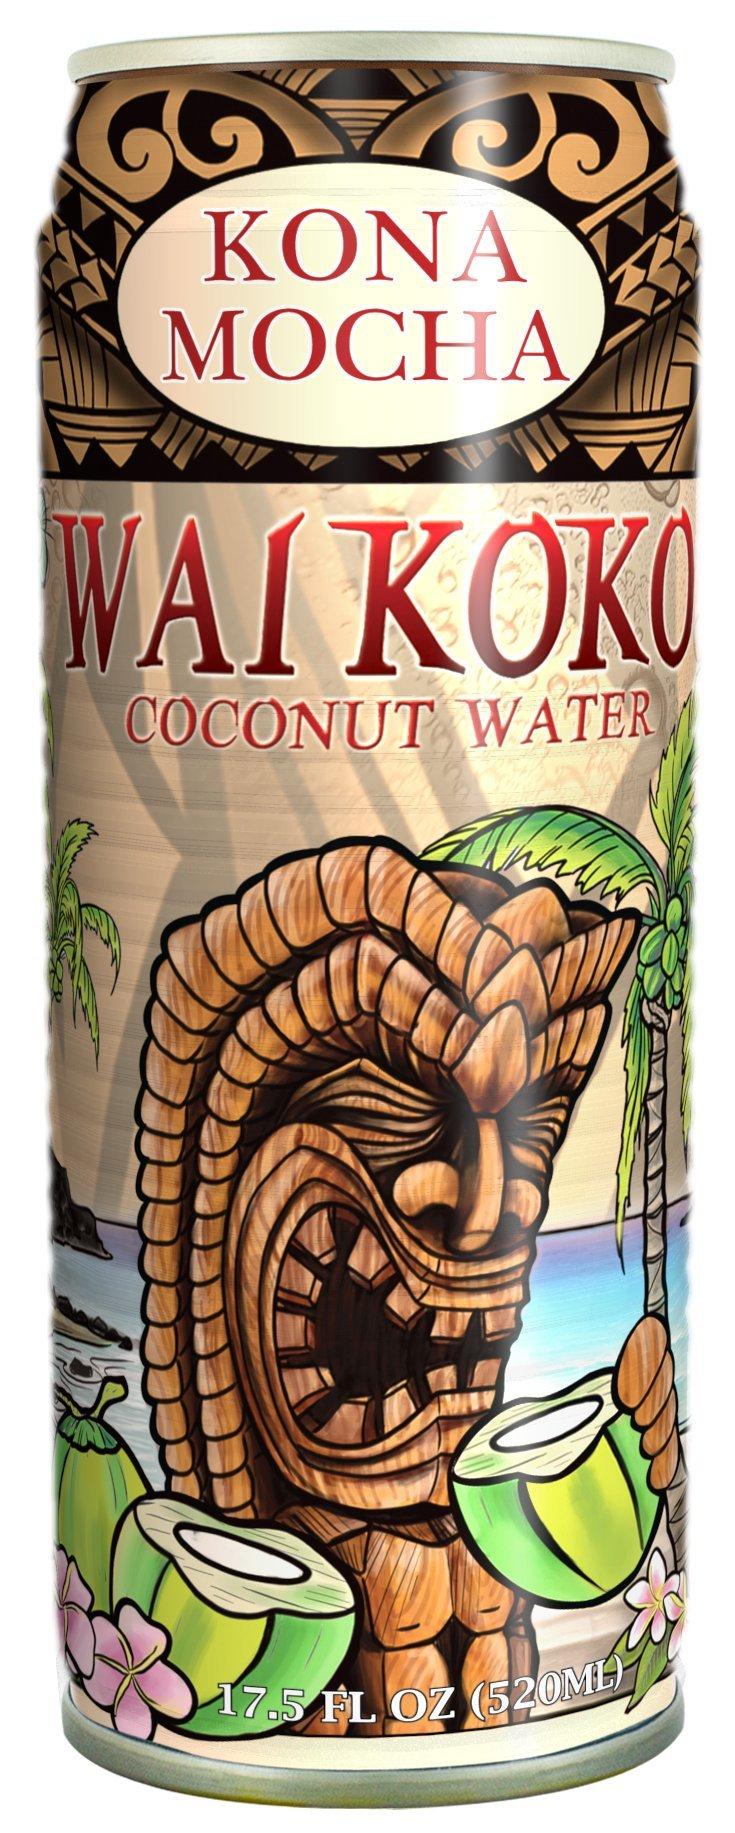 Wai Koko Coconut Water, Kona Mocha, 17.5-ounce (Pack of 12)